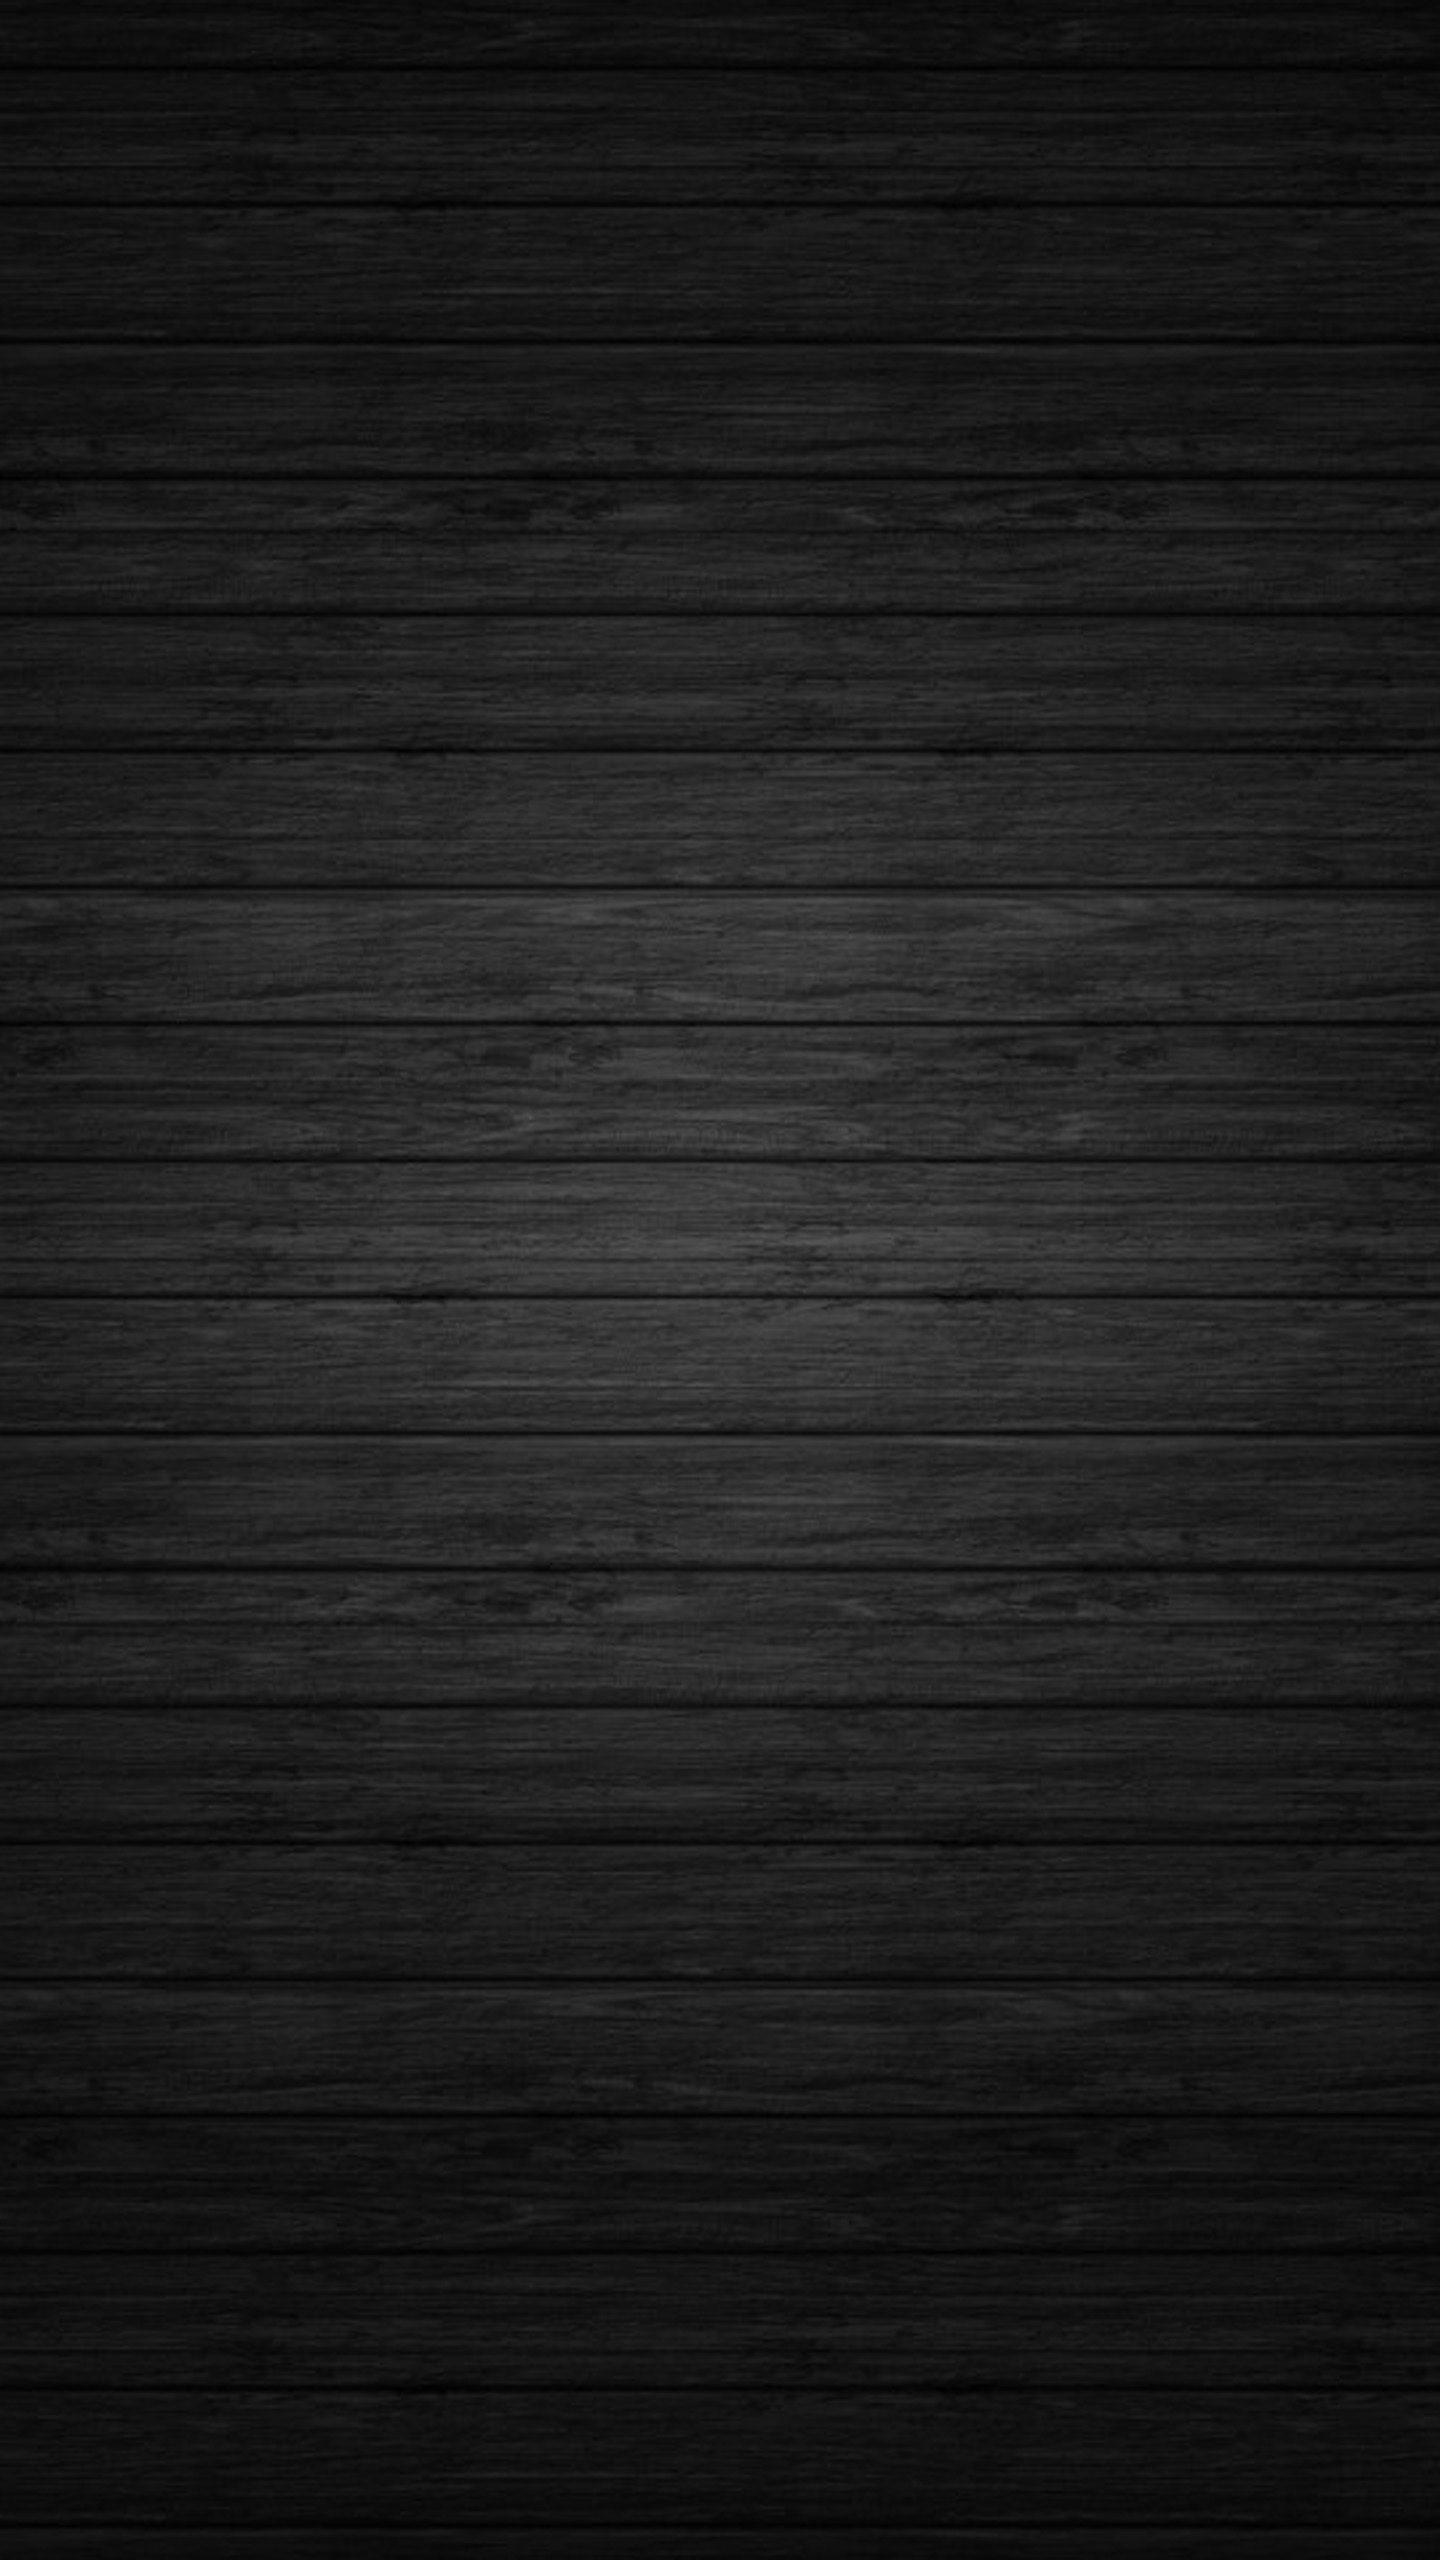 Samsung Galaxy Background Sf Wallpaper